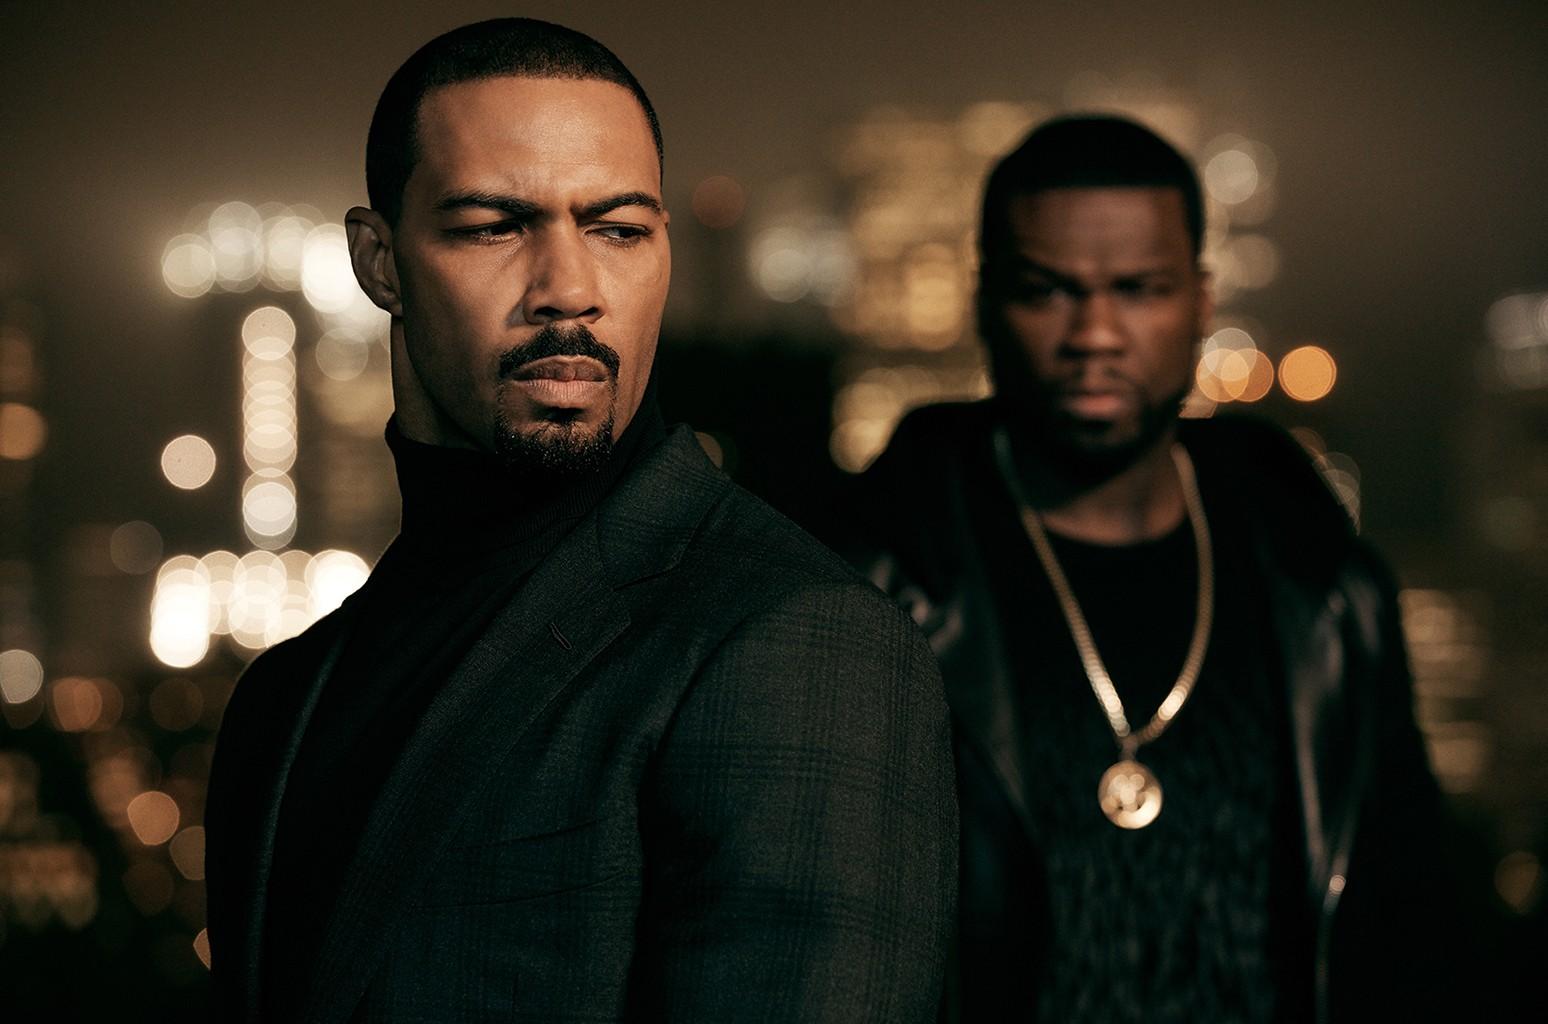 Omari Hardwick and Curtis '50 cent' Jackson on Power.